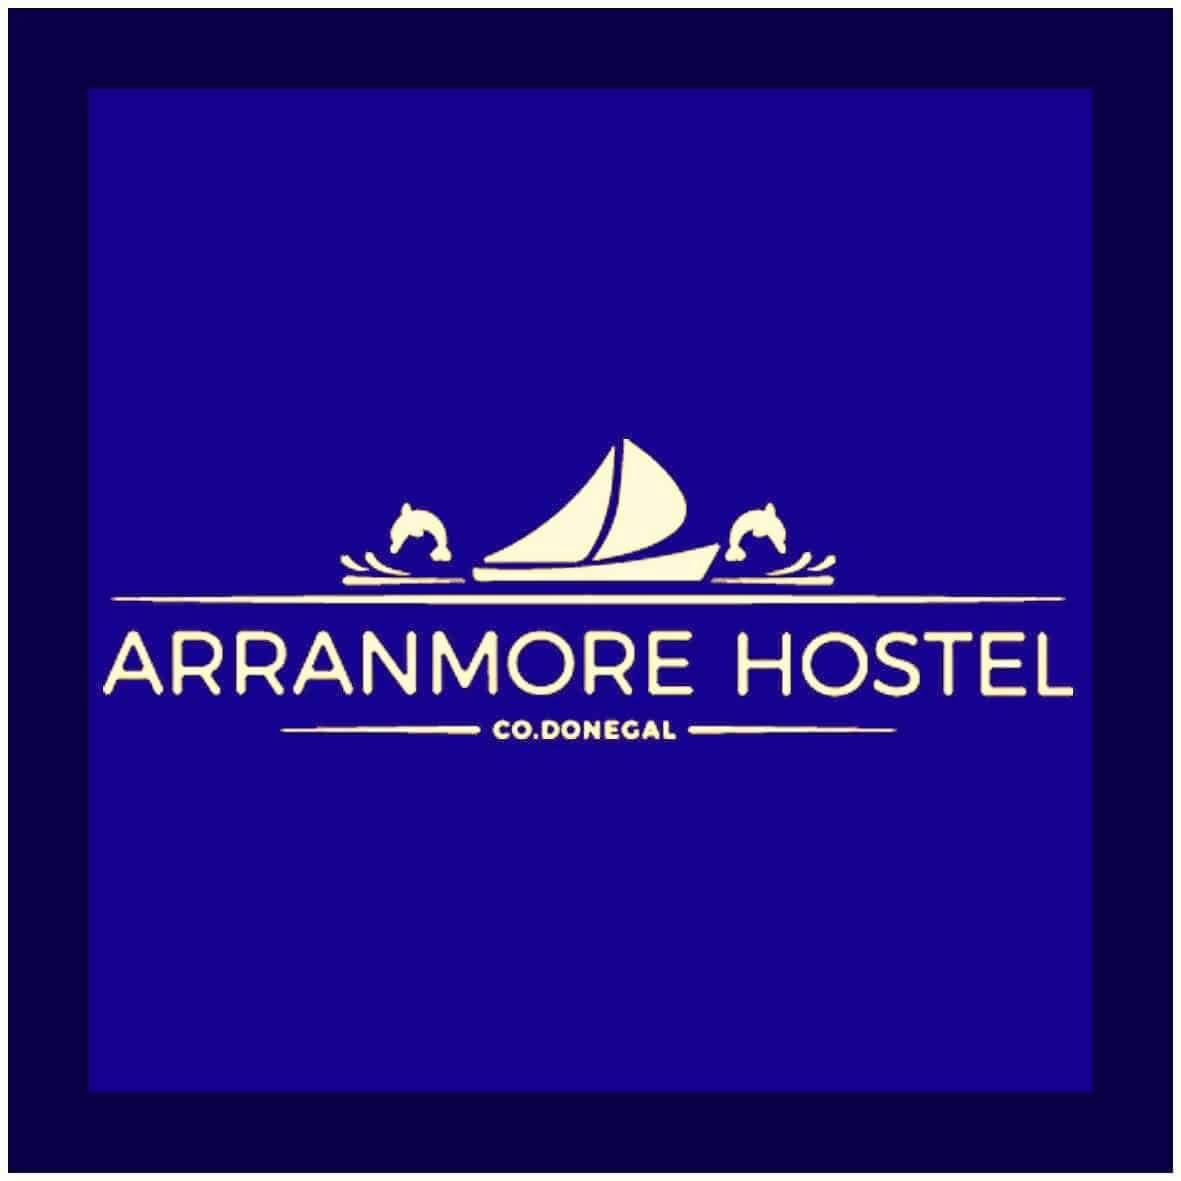 Arranmore Hostel